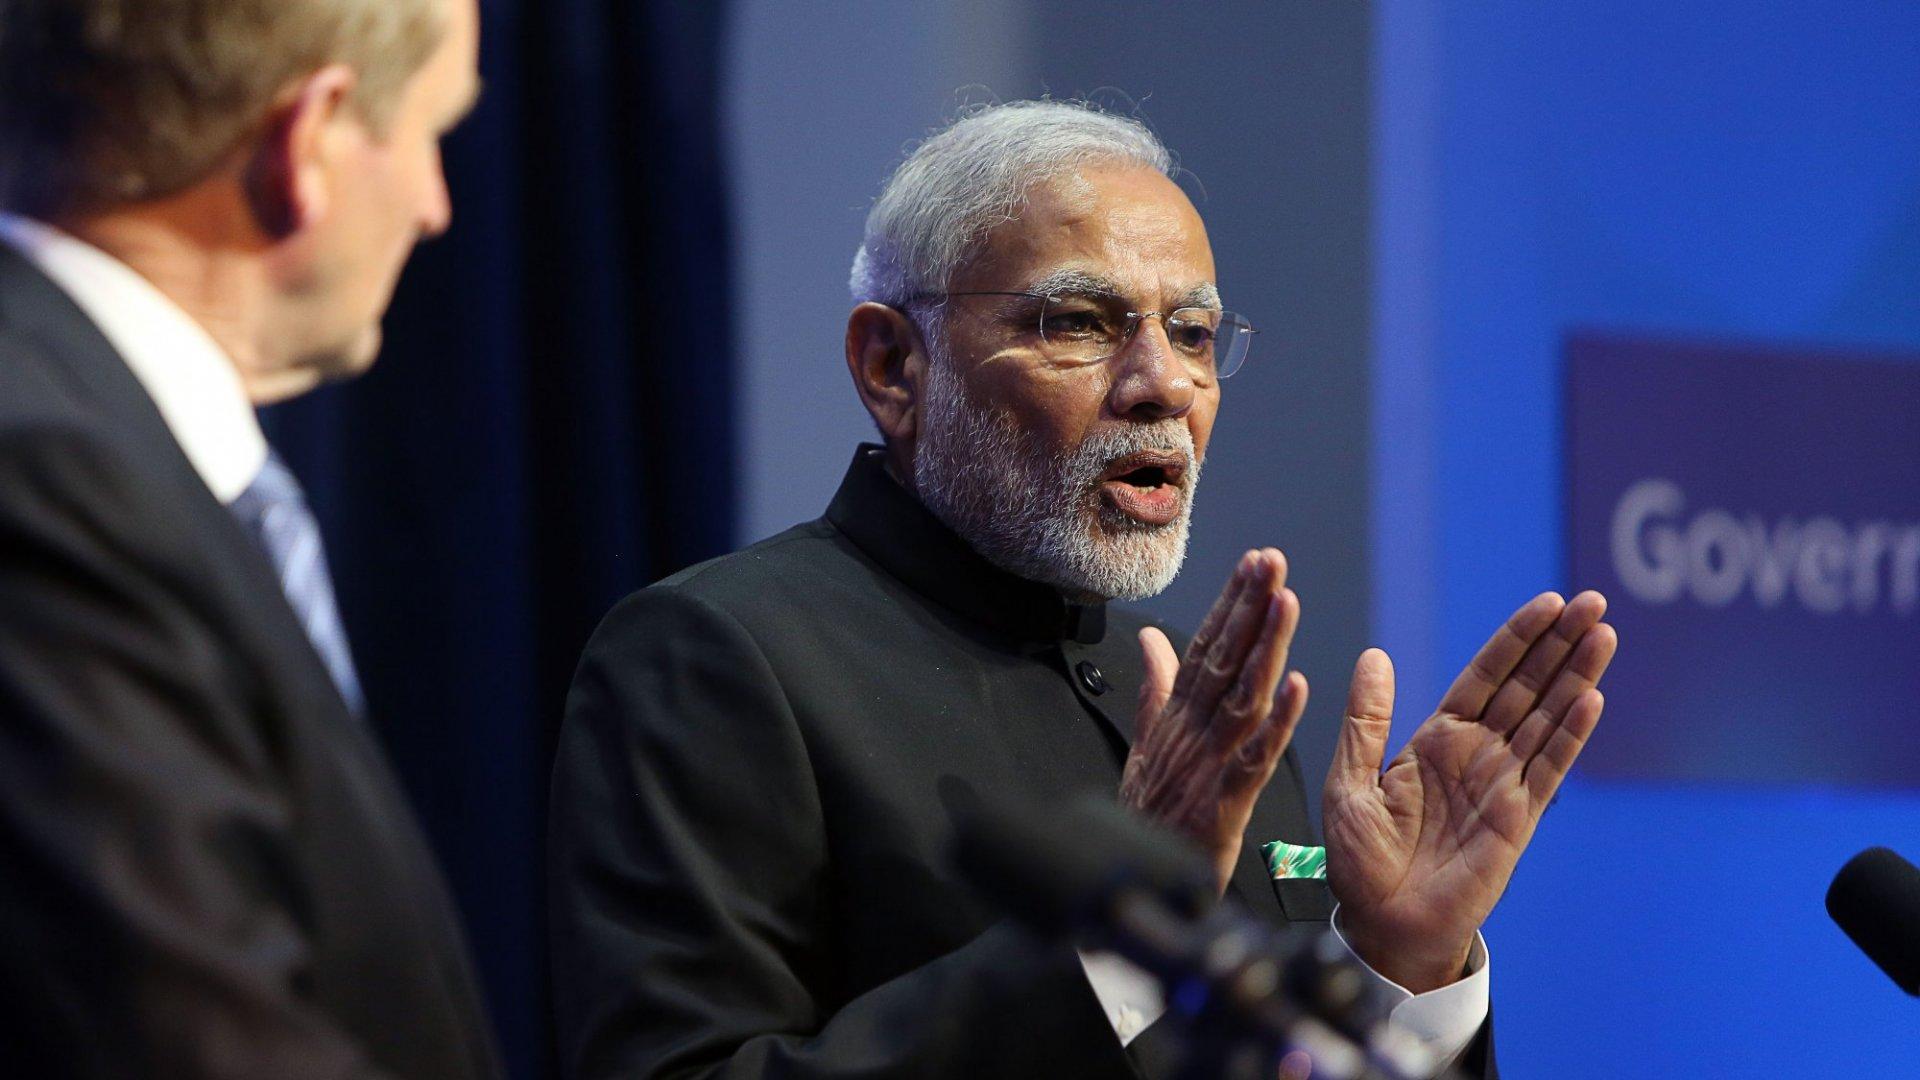 Zuckerberg, Modi Talk Internet Connectivity in India at Facebook Townhall